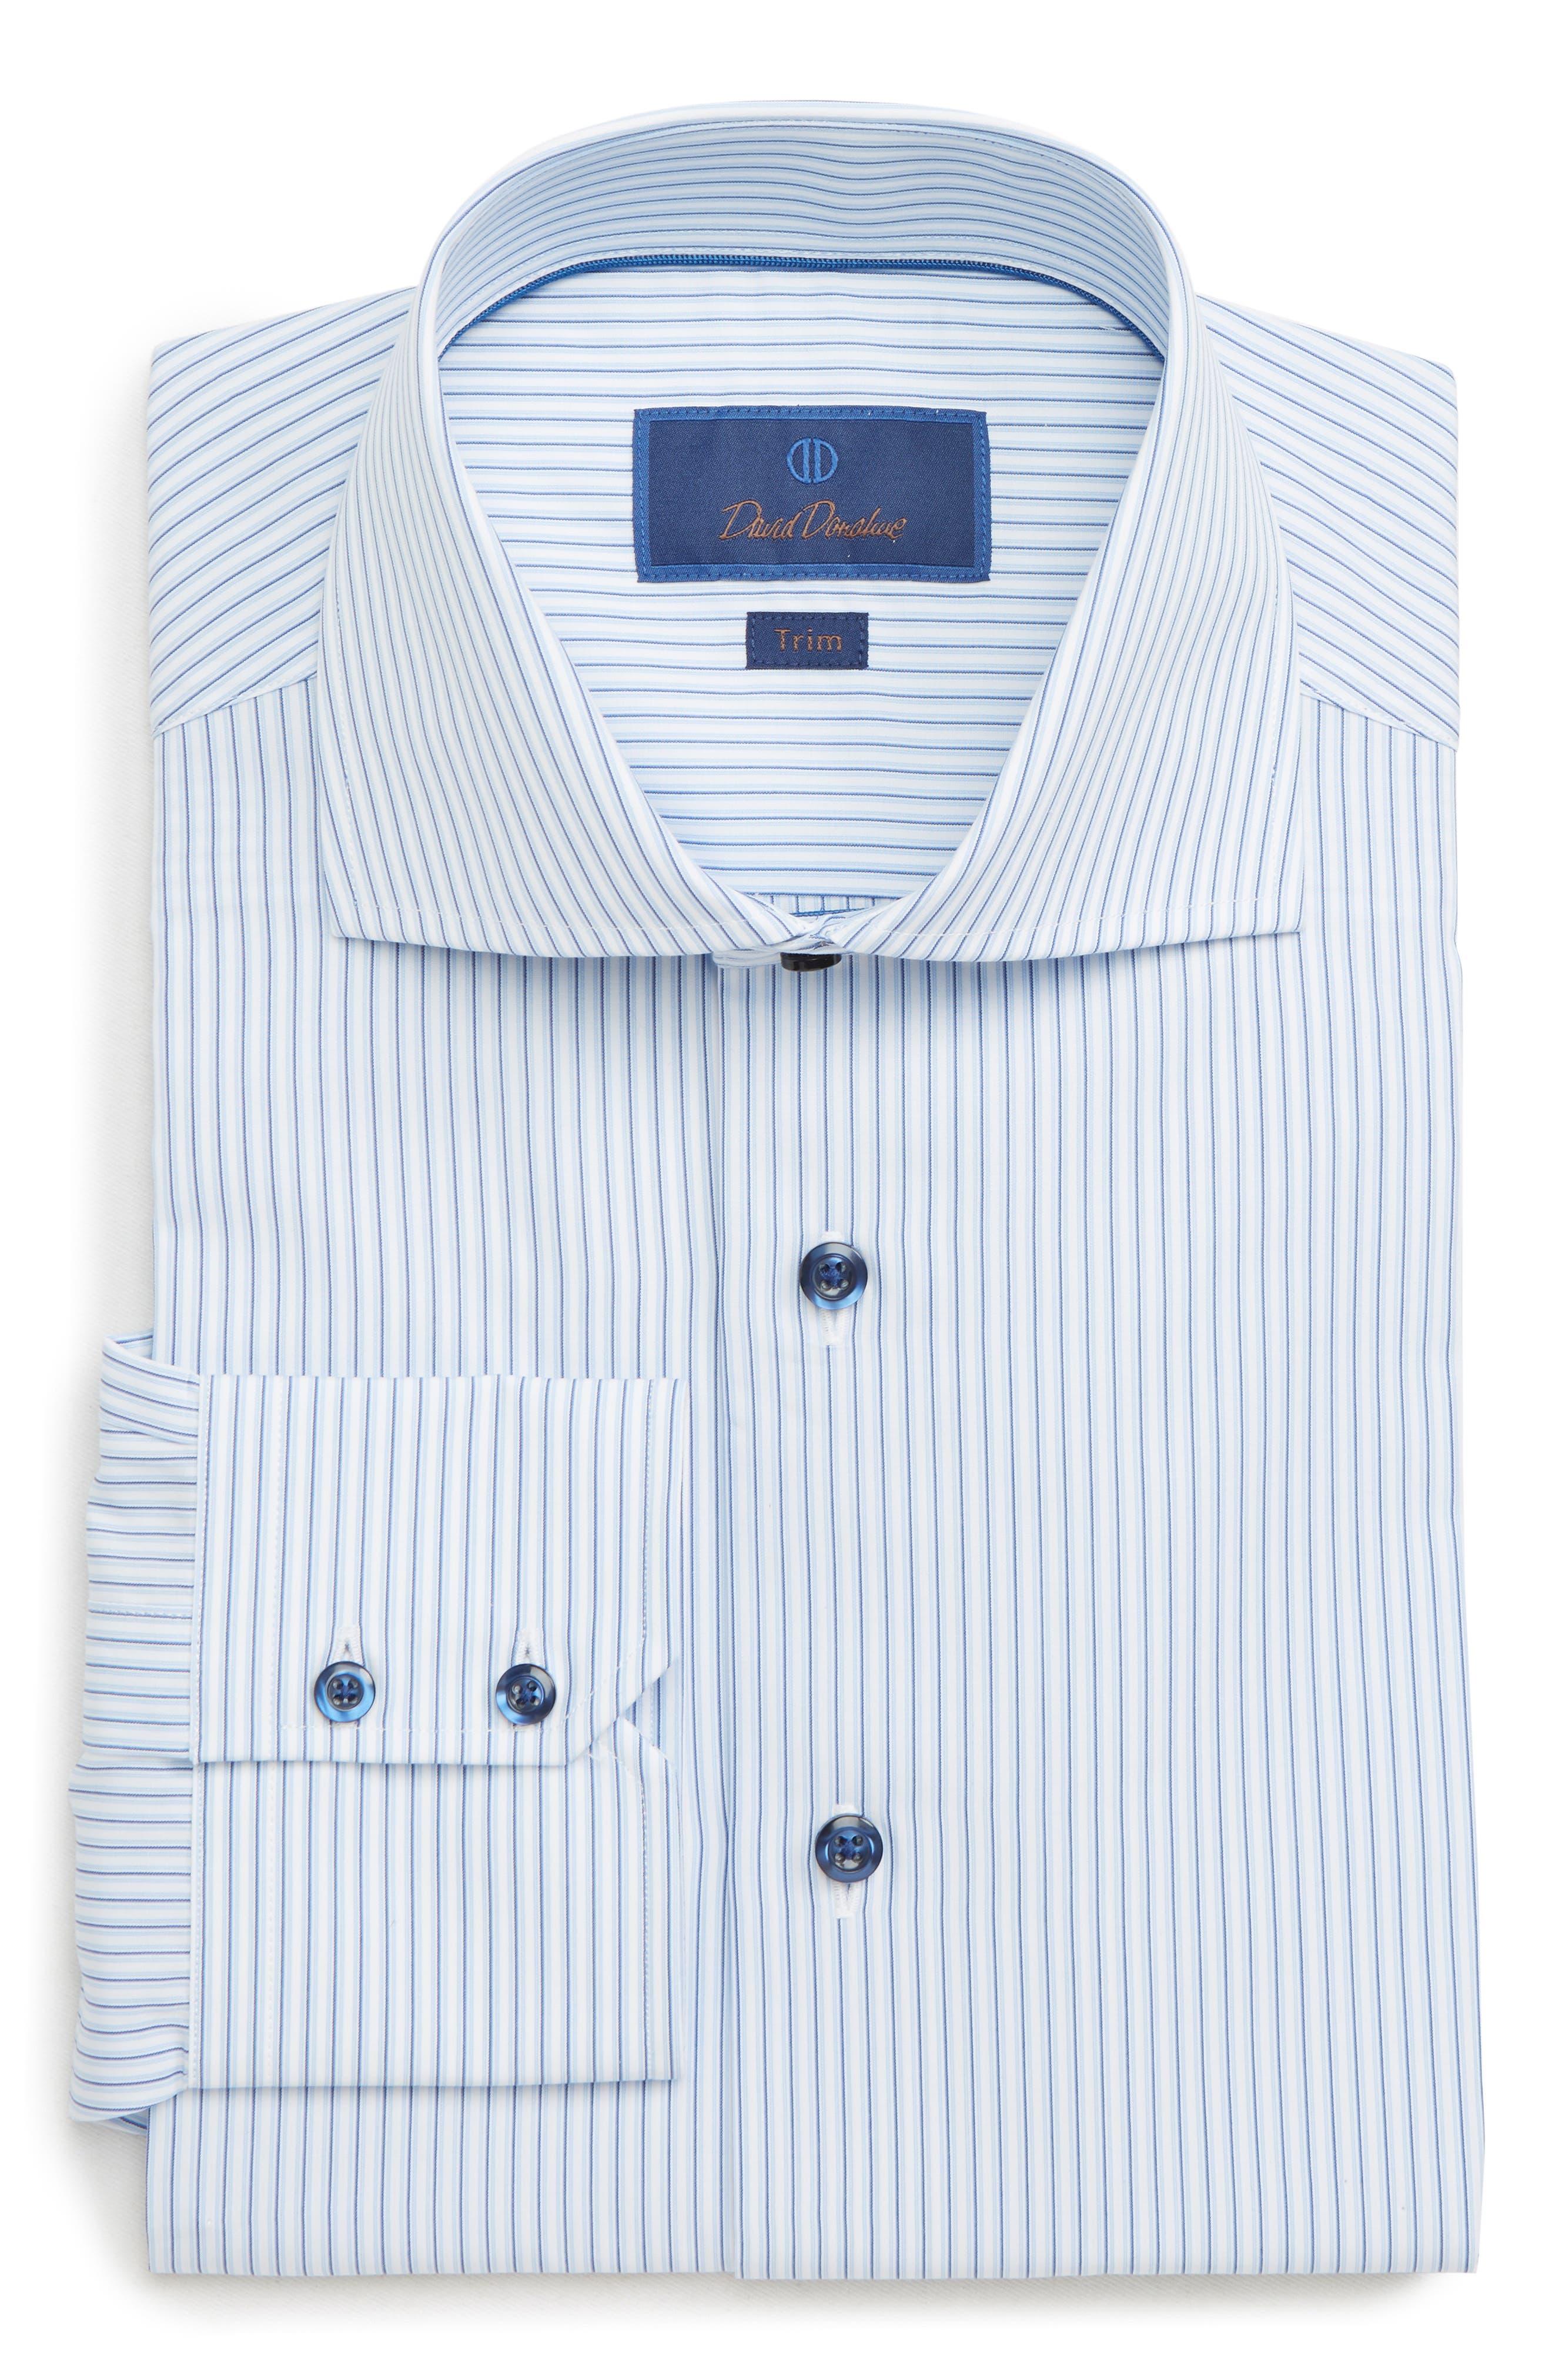 Trim Fit Stripe Dress Shirt,                         Main,                         color, WHITE/ BLUE